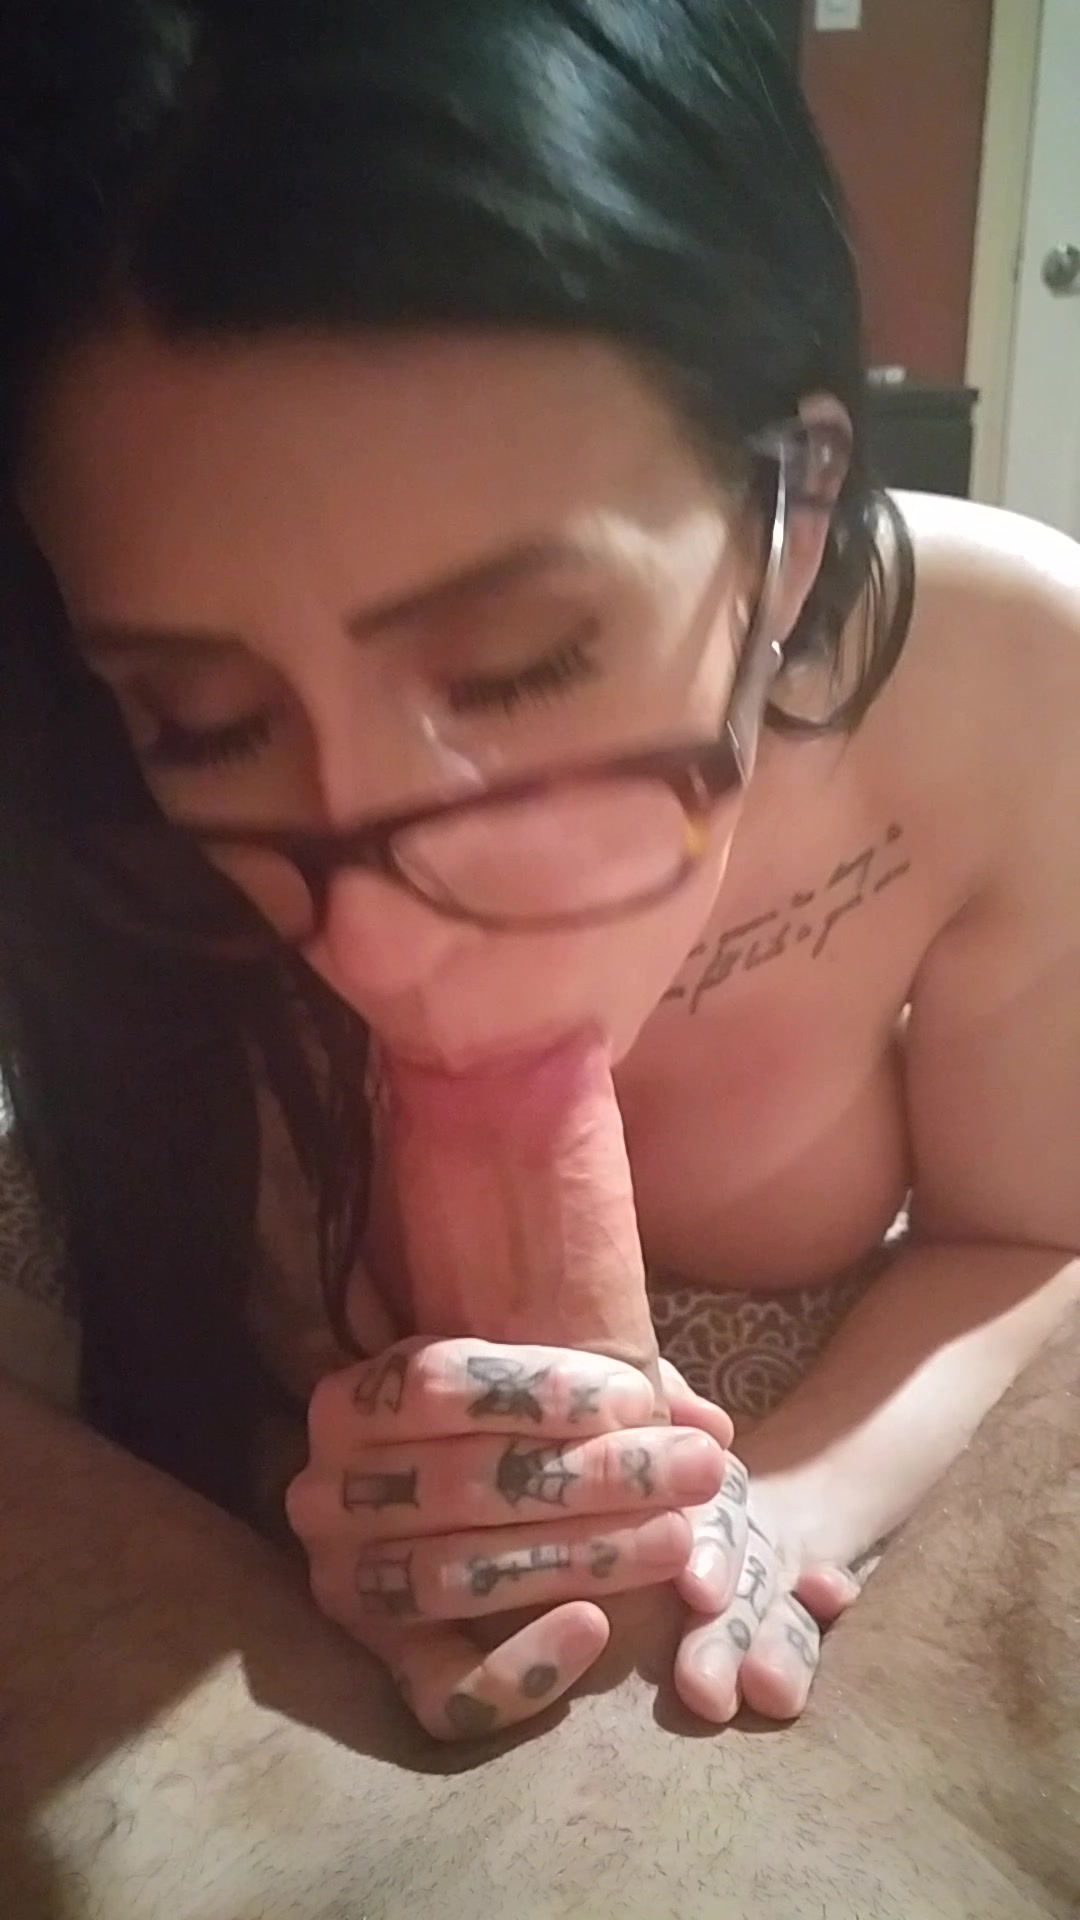 EmiraFoods – Full sex tape porn video leak